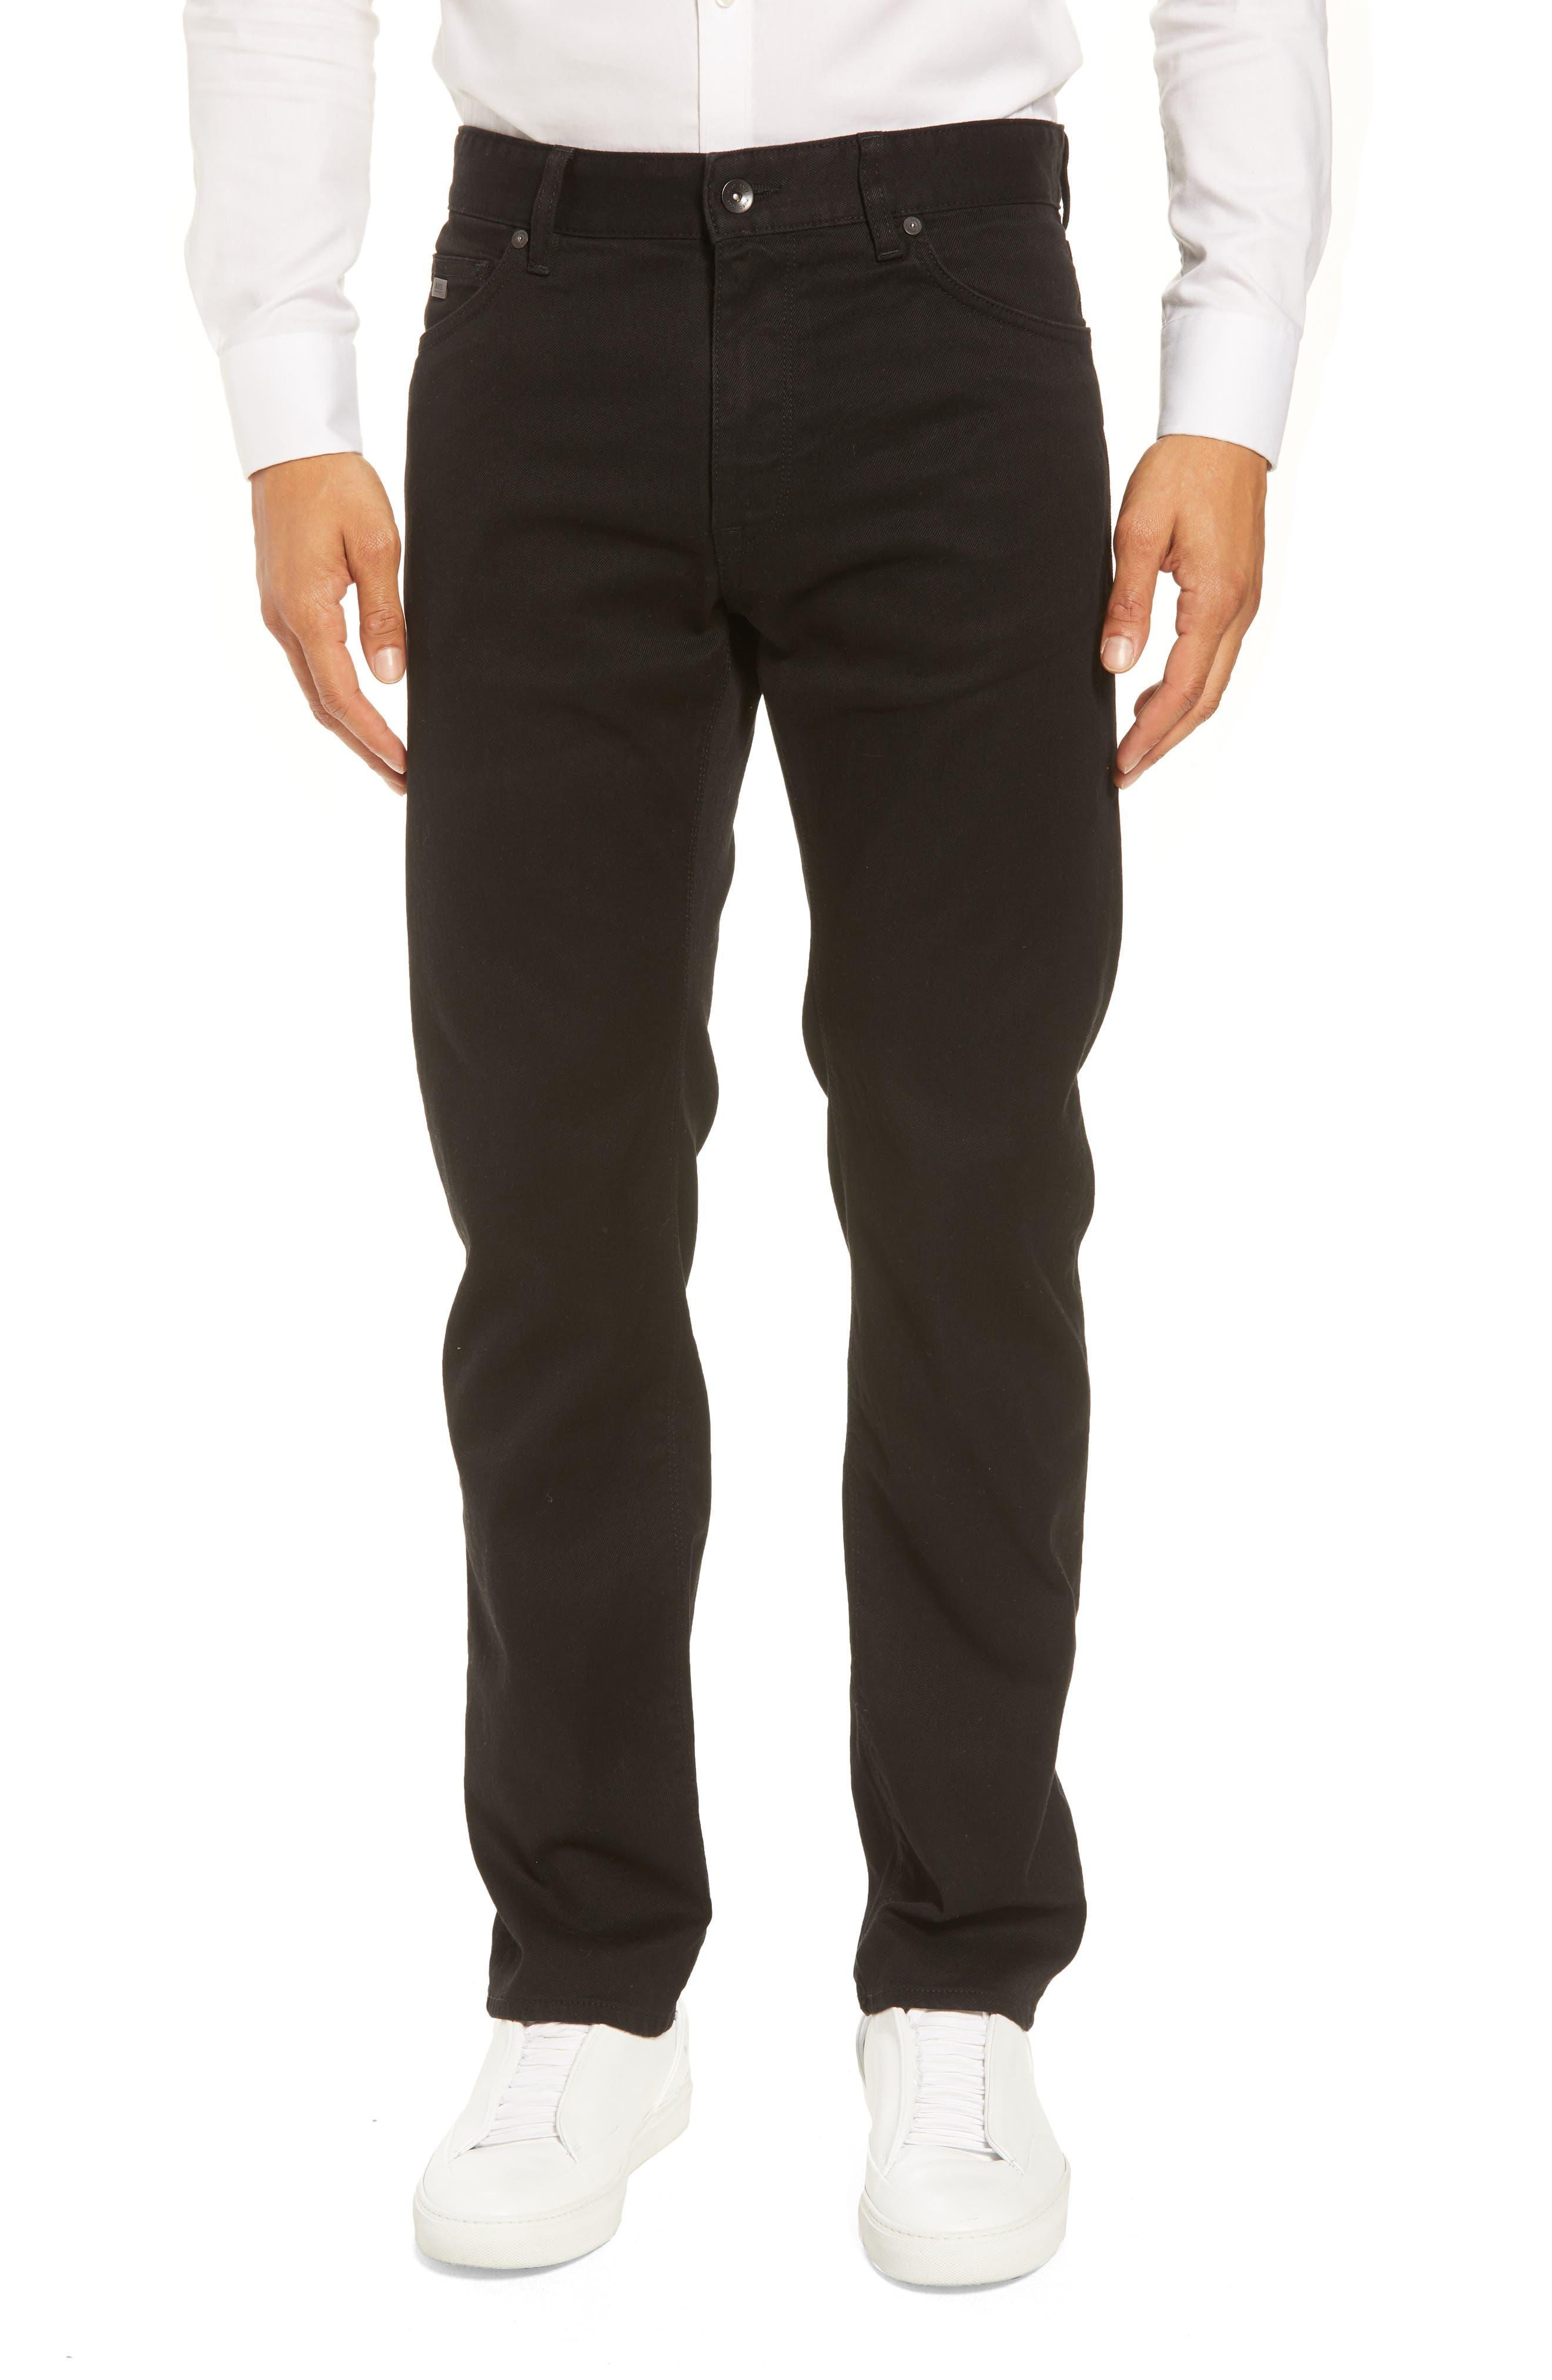 Maine Straight Leg Jeans,                             Main thumbnail 1, color,                             Black